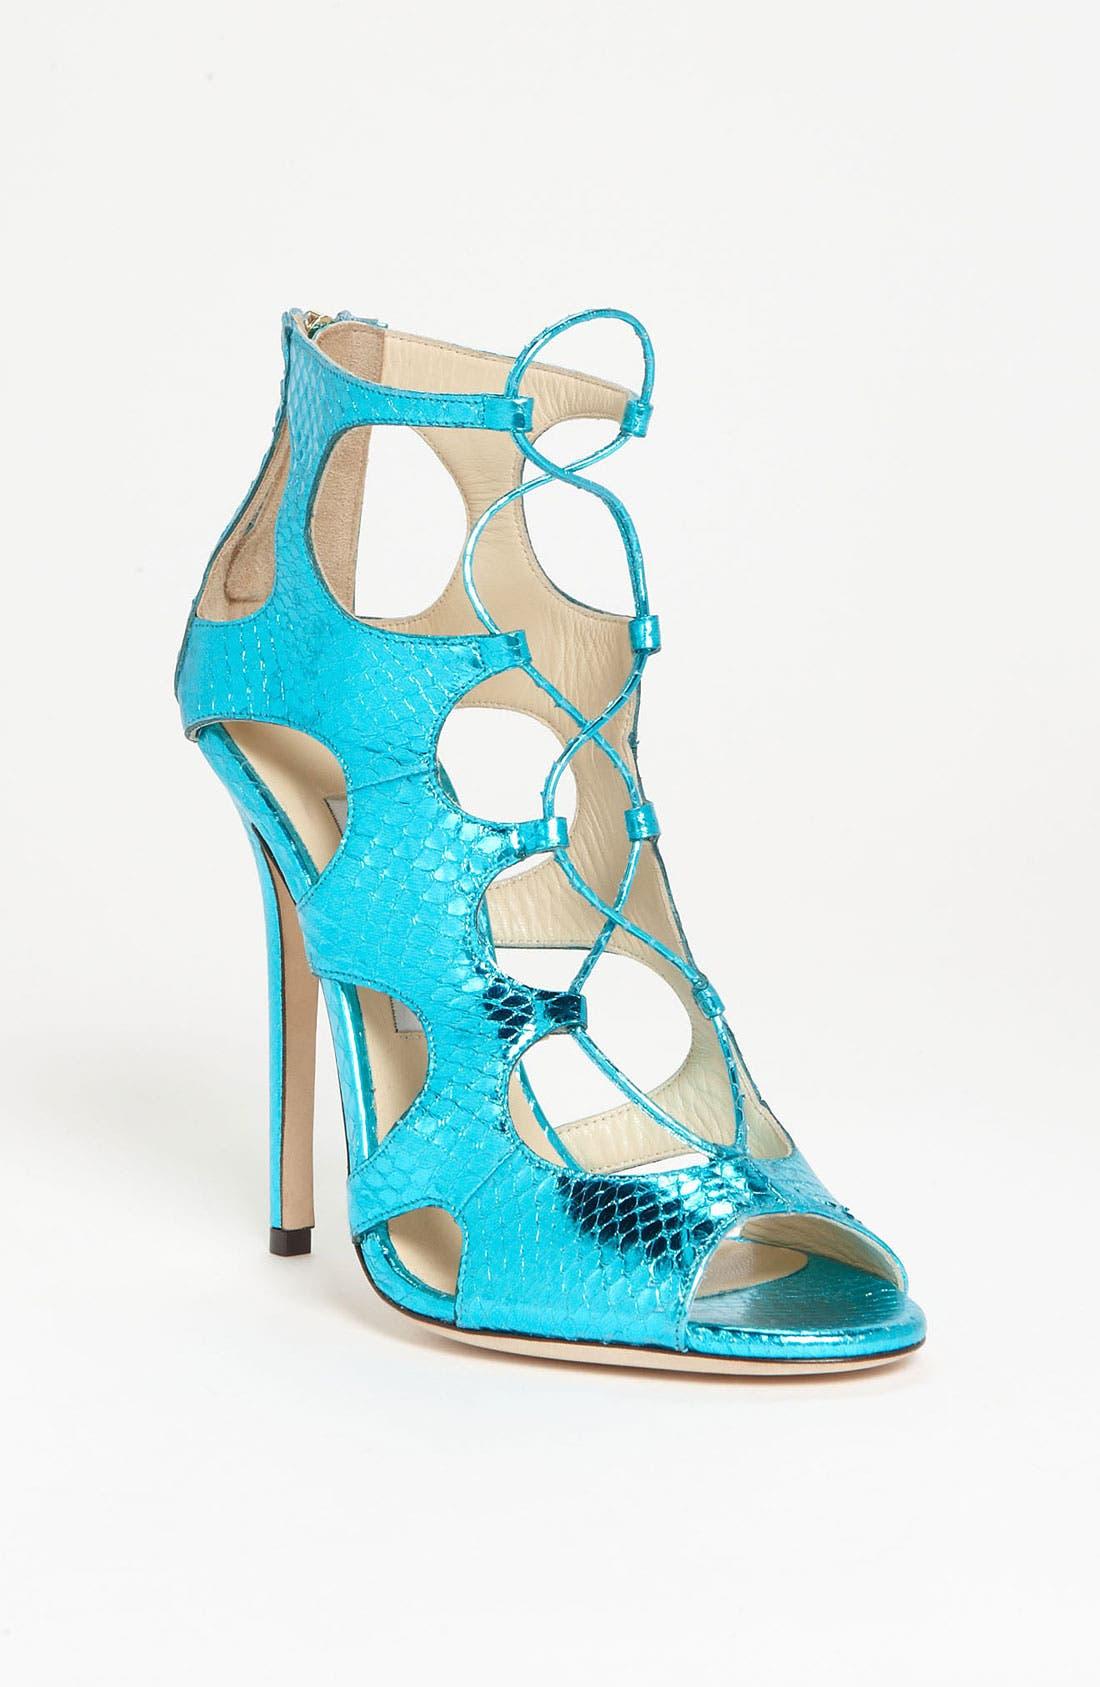 Alternate Image 1 Selected - Jimmy Choo 'Diffuse' Sandal